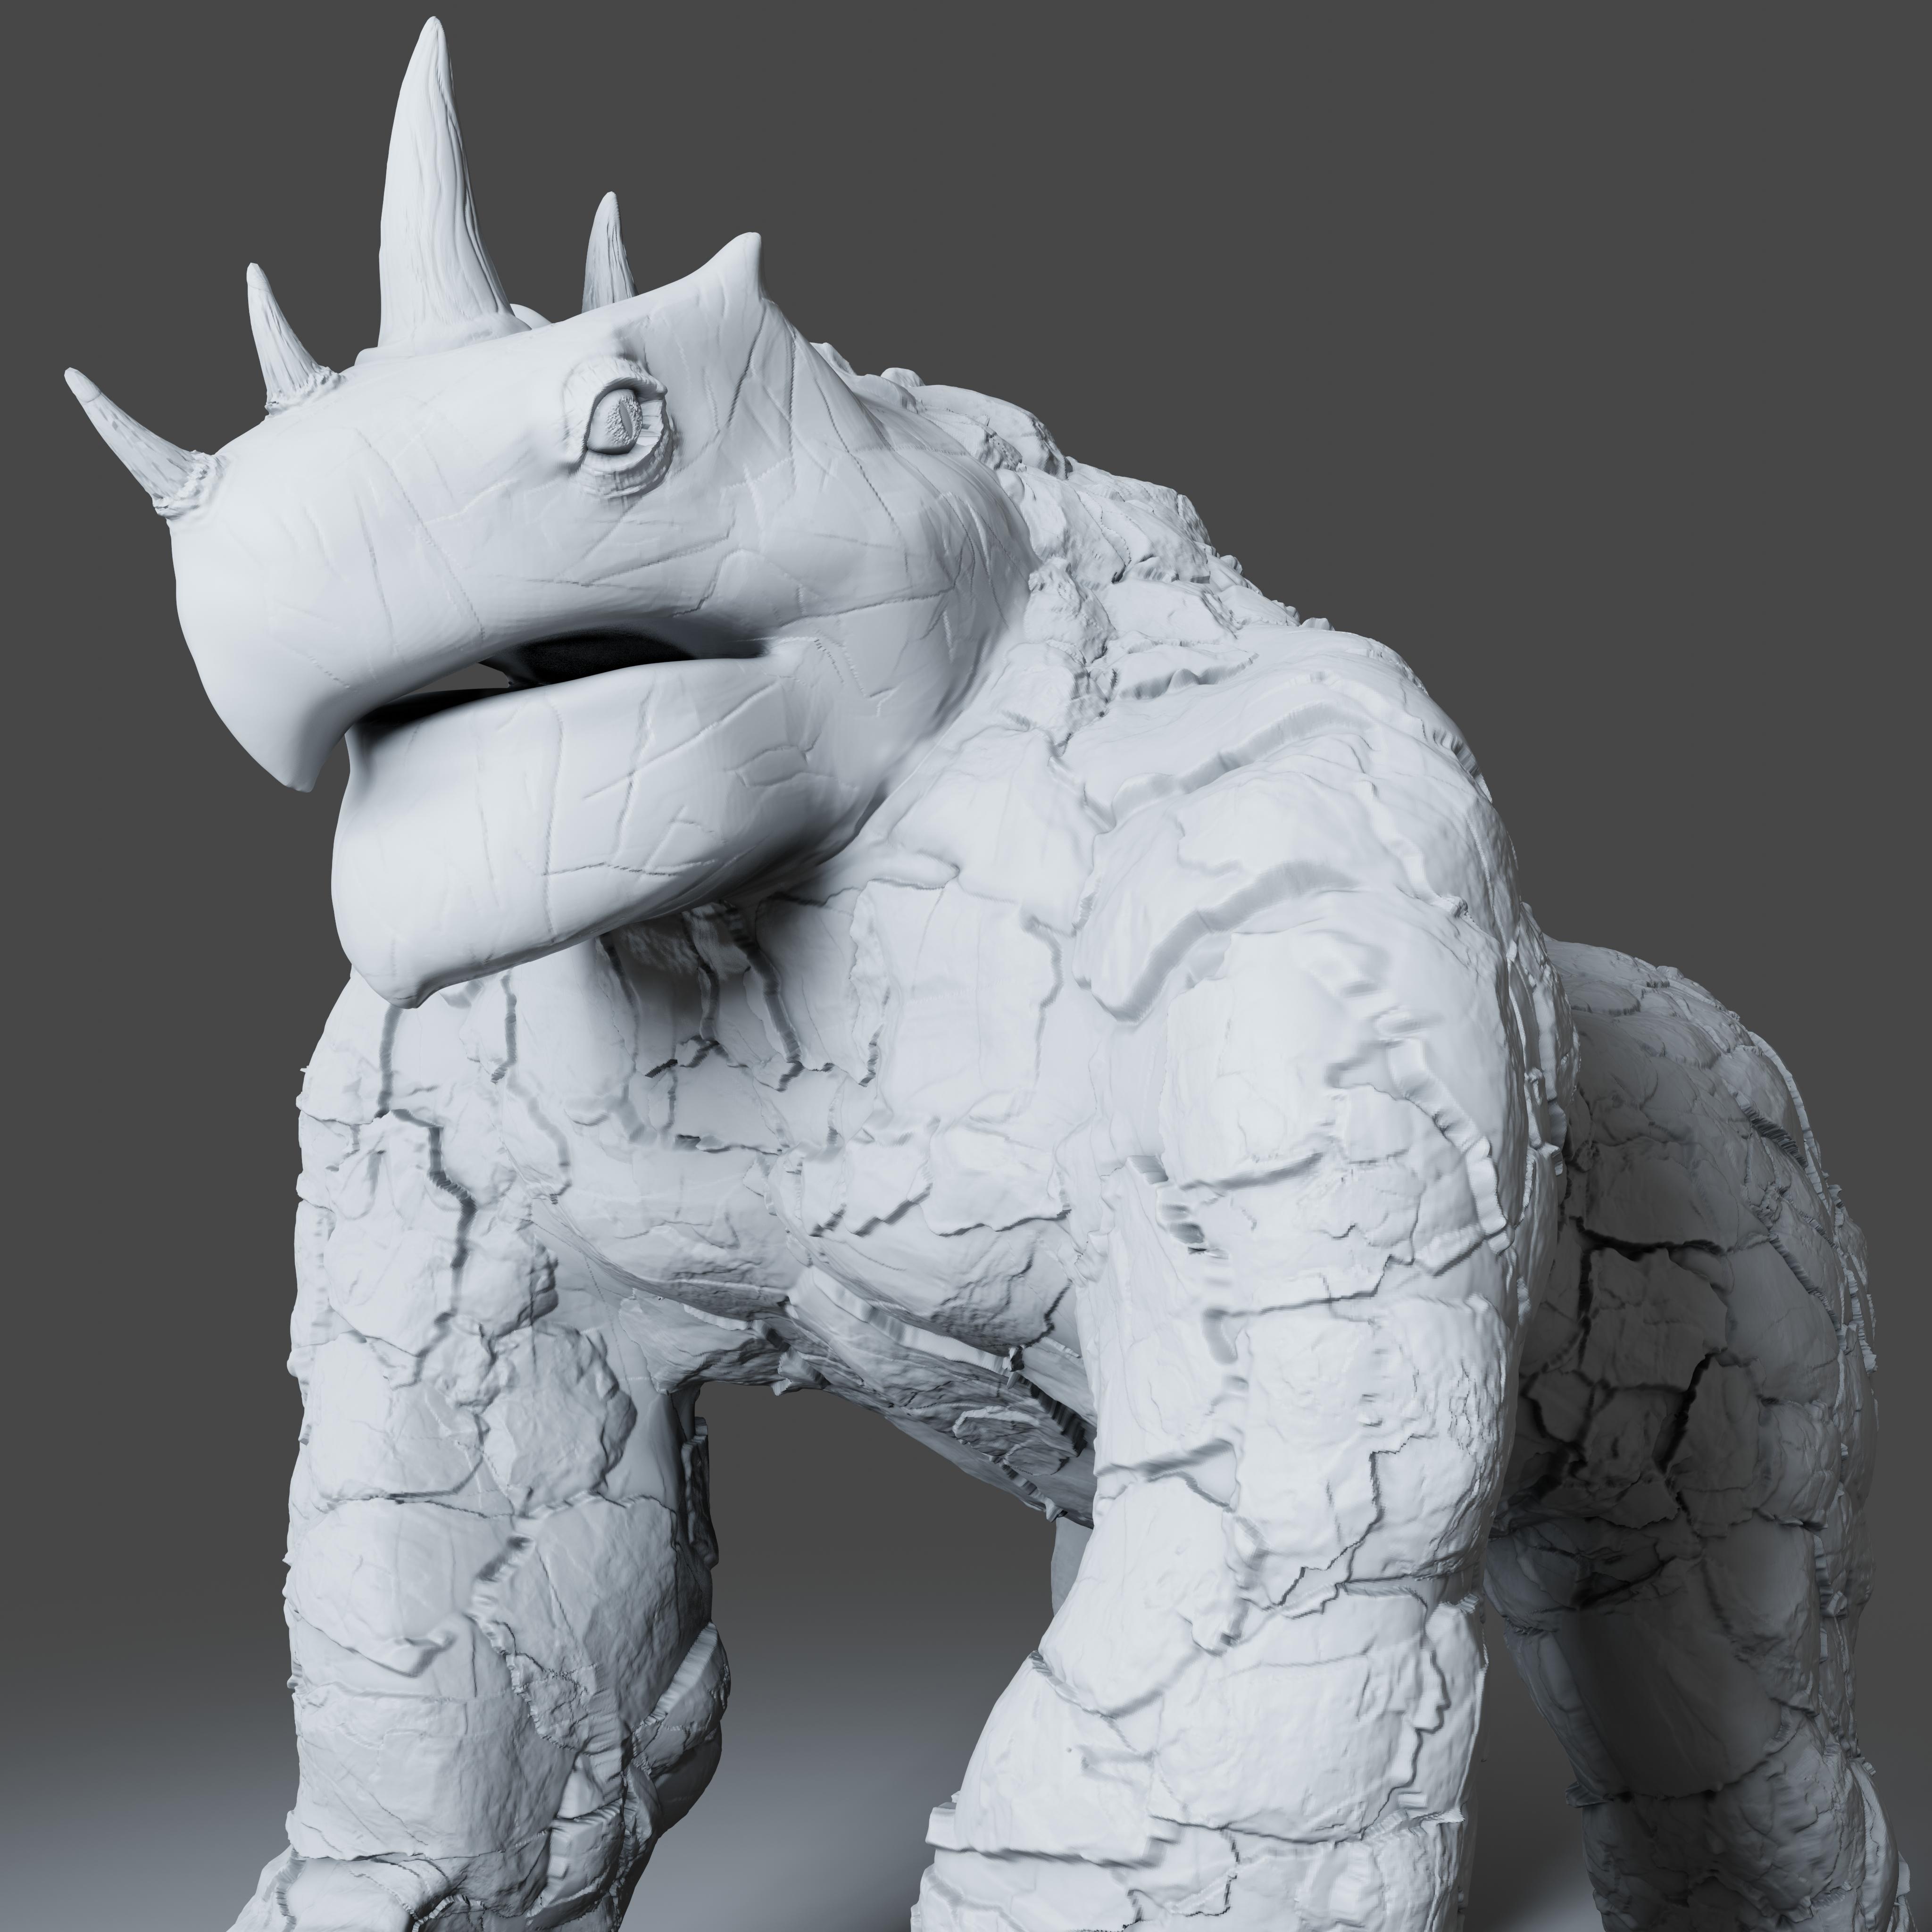 Preview4.jpg Download STL file Gorilla Turtle Monster - 3D Print Model • 3D printer object, DudeX